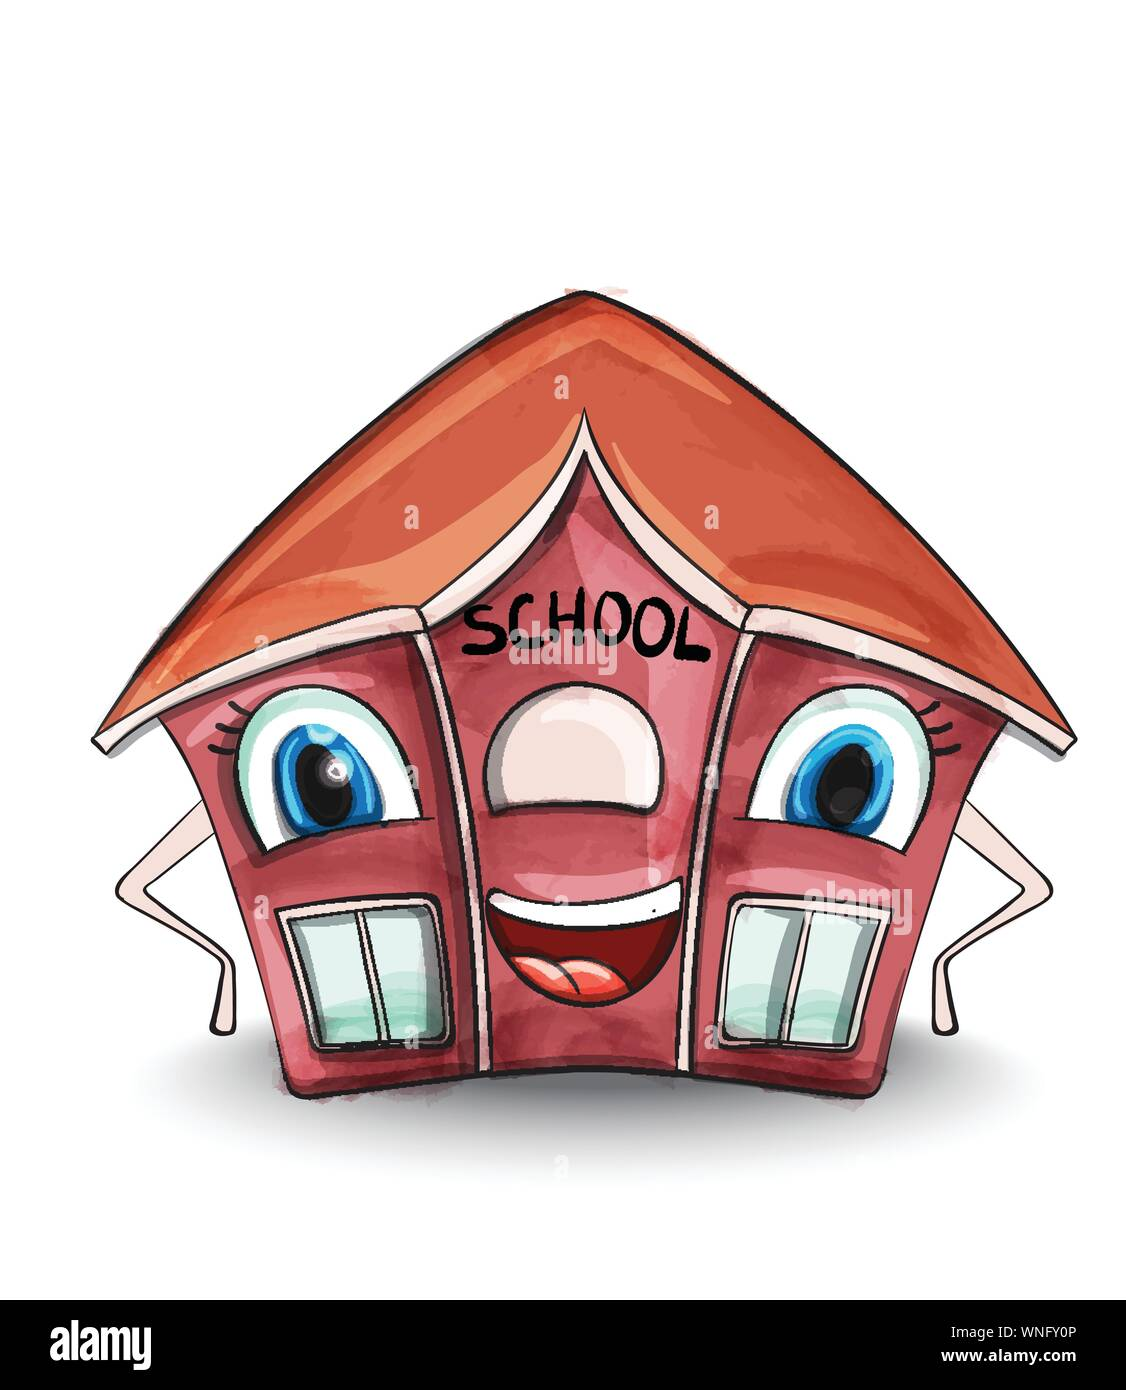 Cartoon School House | Red school house, Homeschool, School clipart